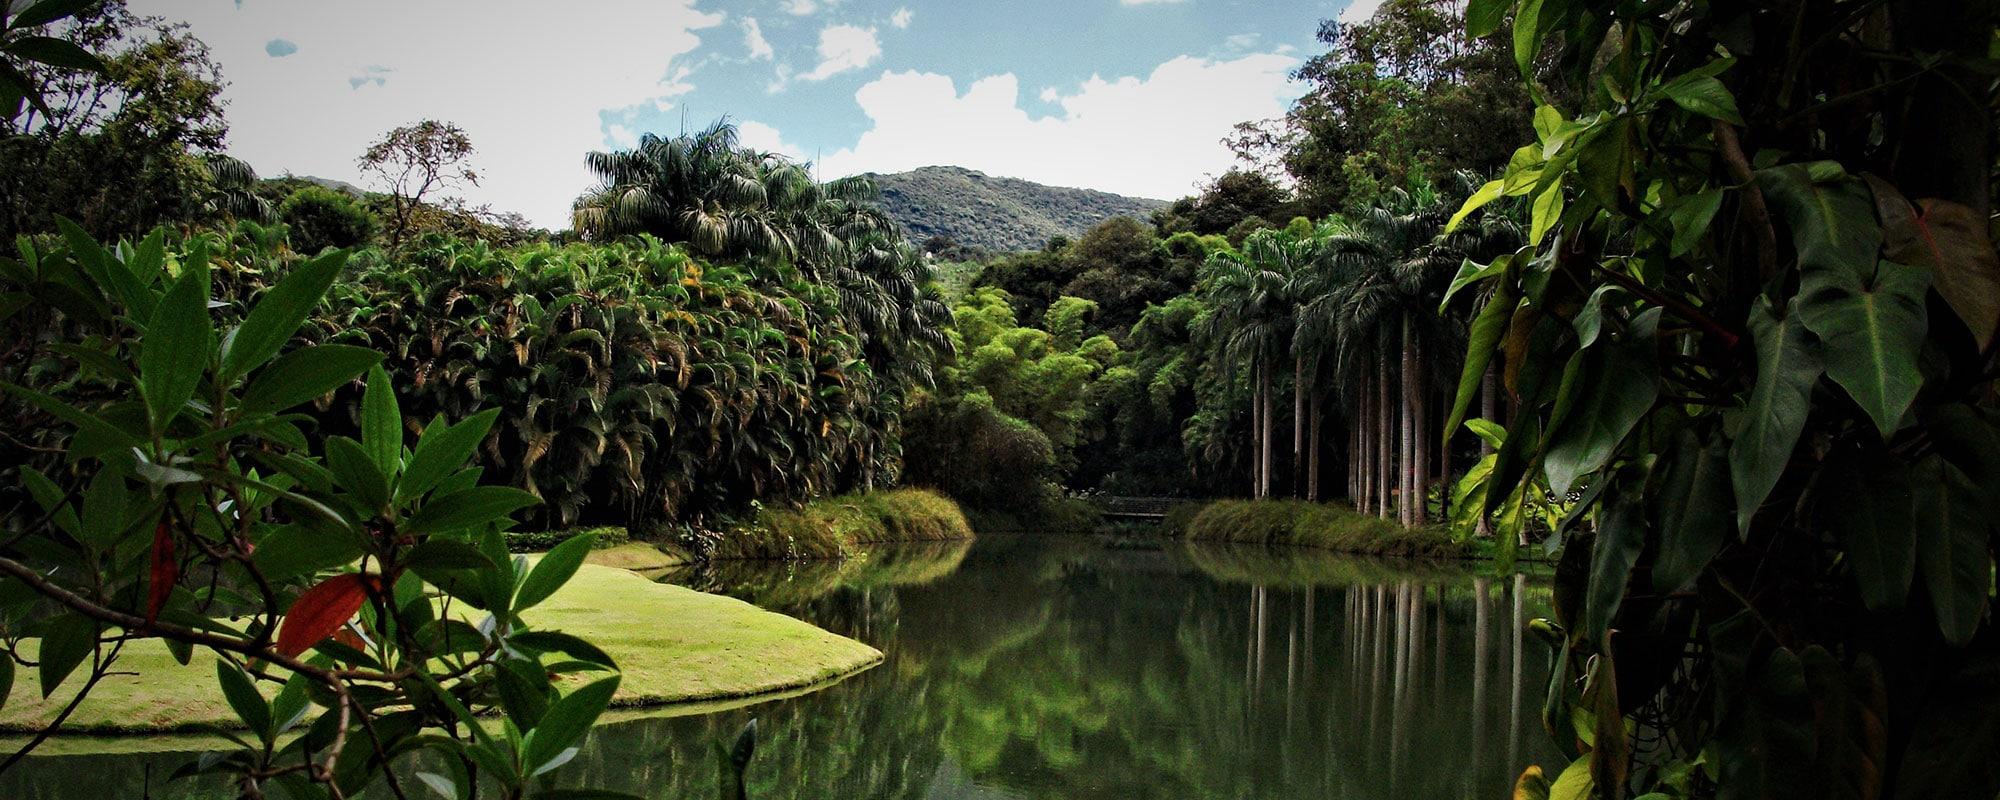 destination bresil foret amazonienne